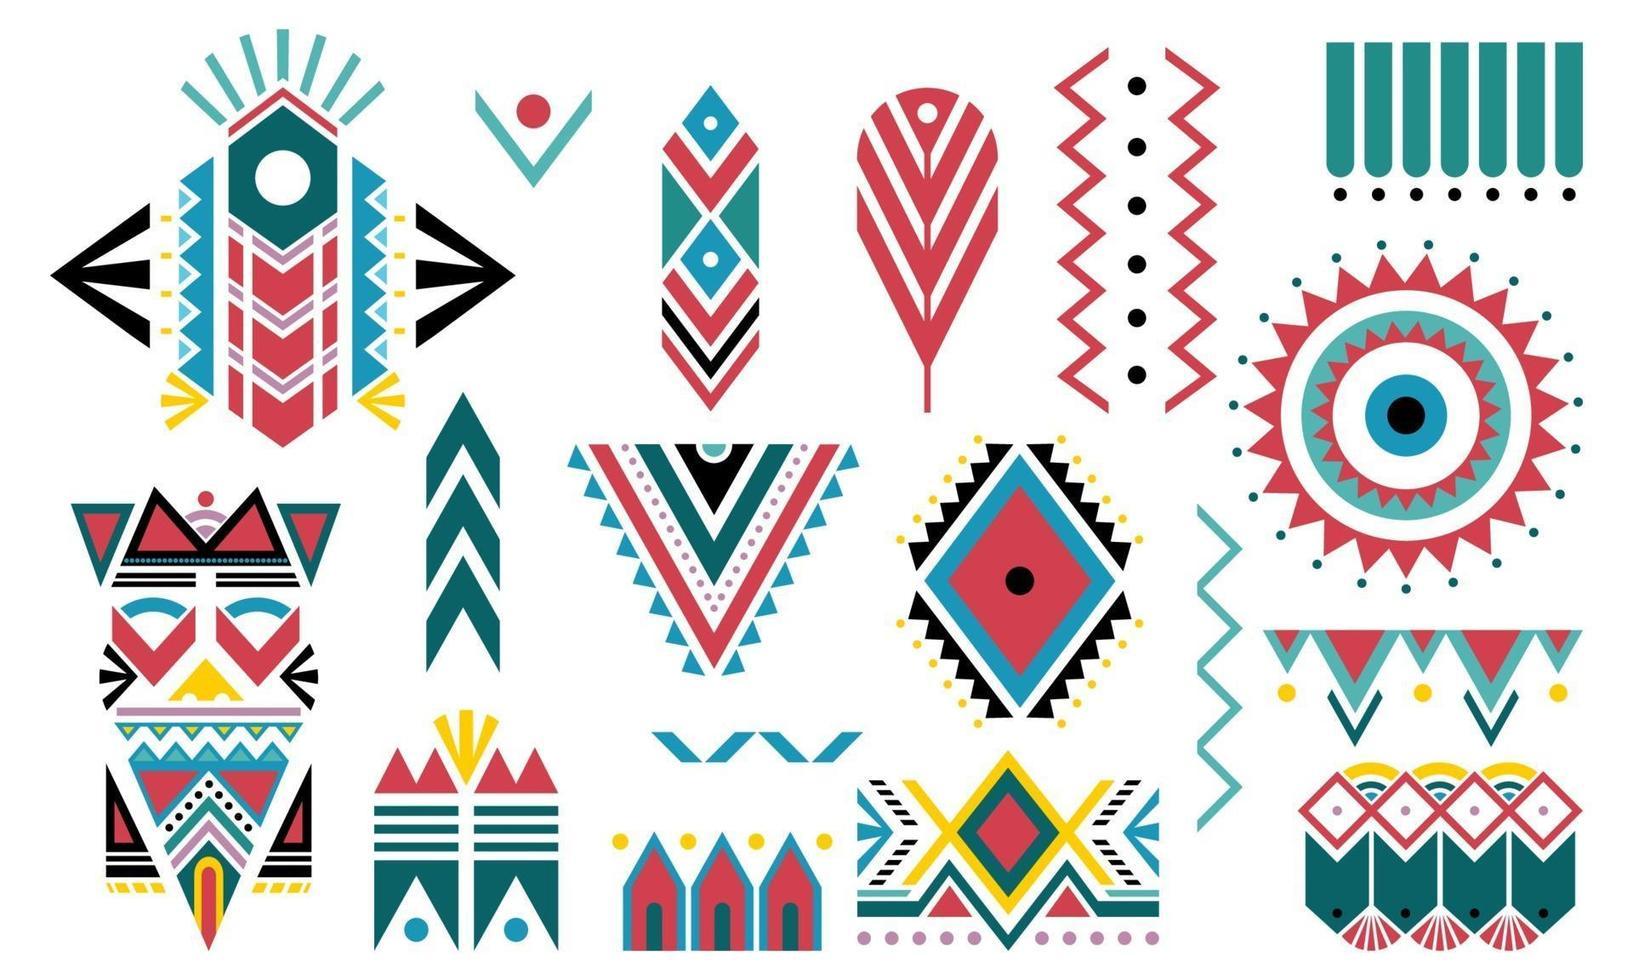 boho colorful. conjunto de elementos decorativos tribais isolado no fundo branco. vetor